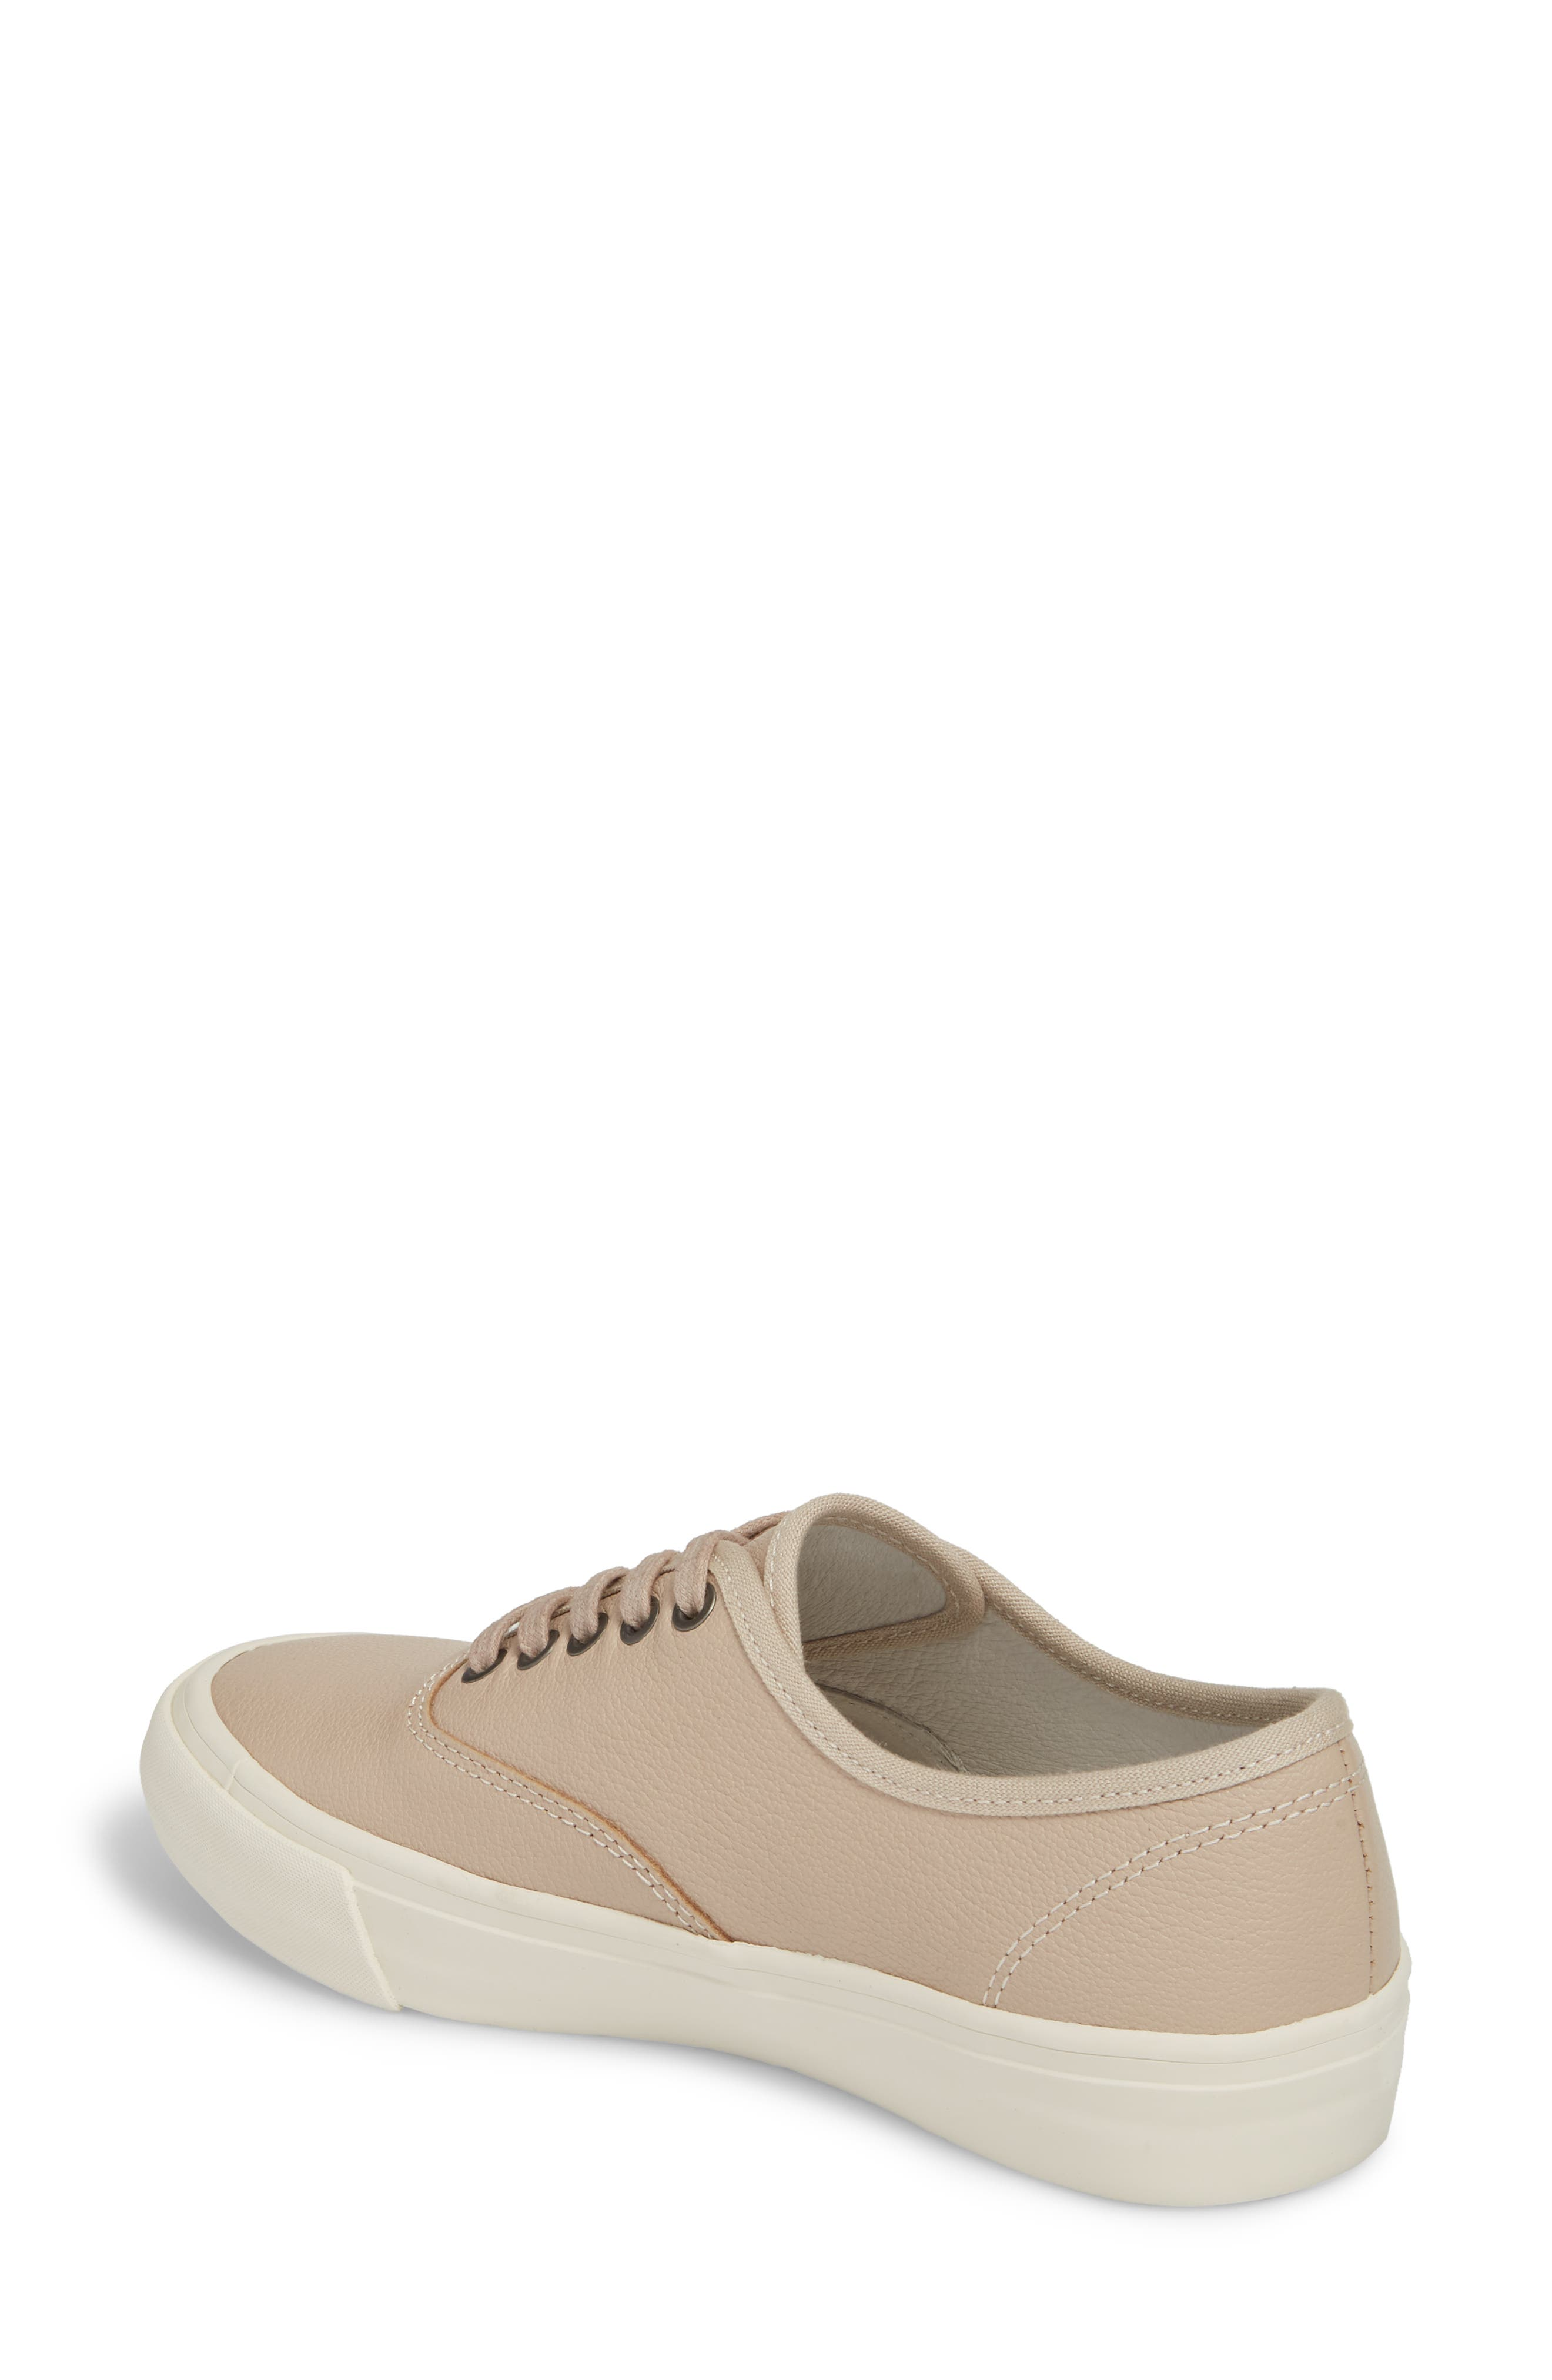 x Derek Lam 10 Crosby Legend Caballero Sneaker,                             Alternate thumbnail 2, color,                             BISQUE